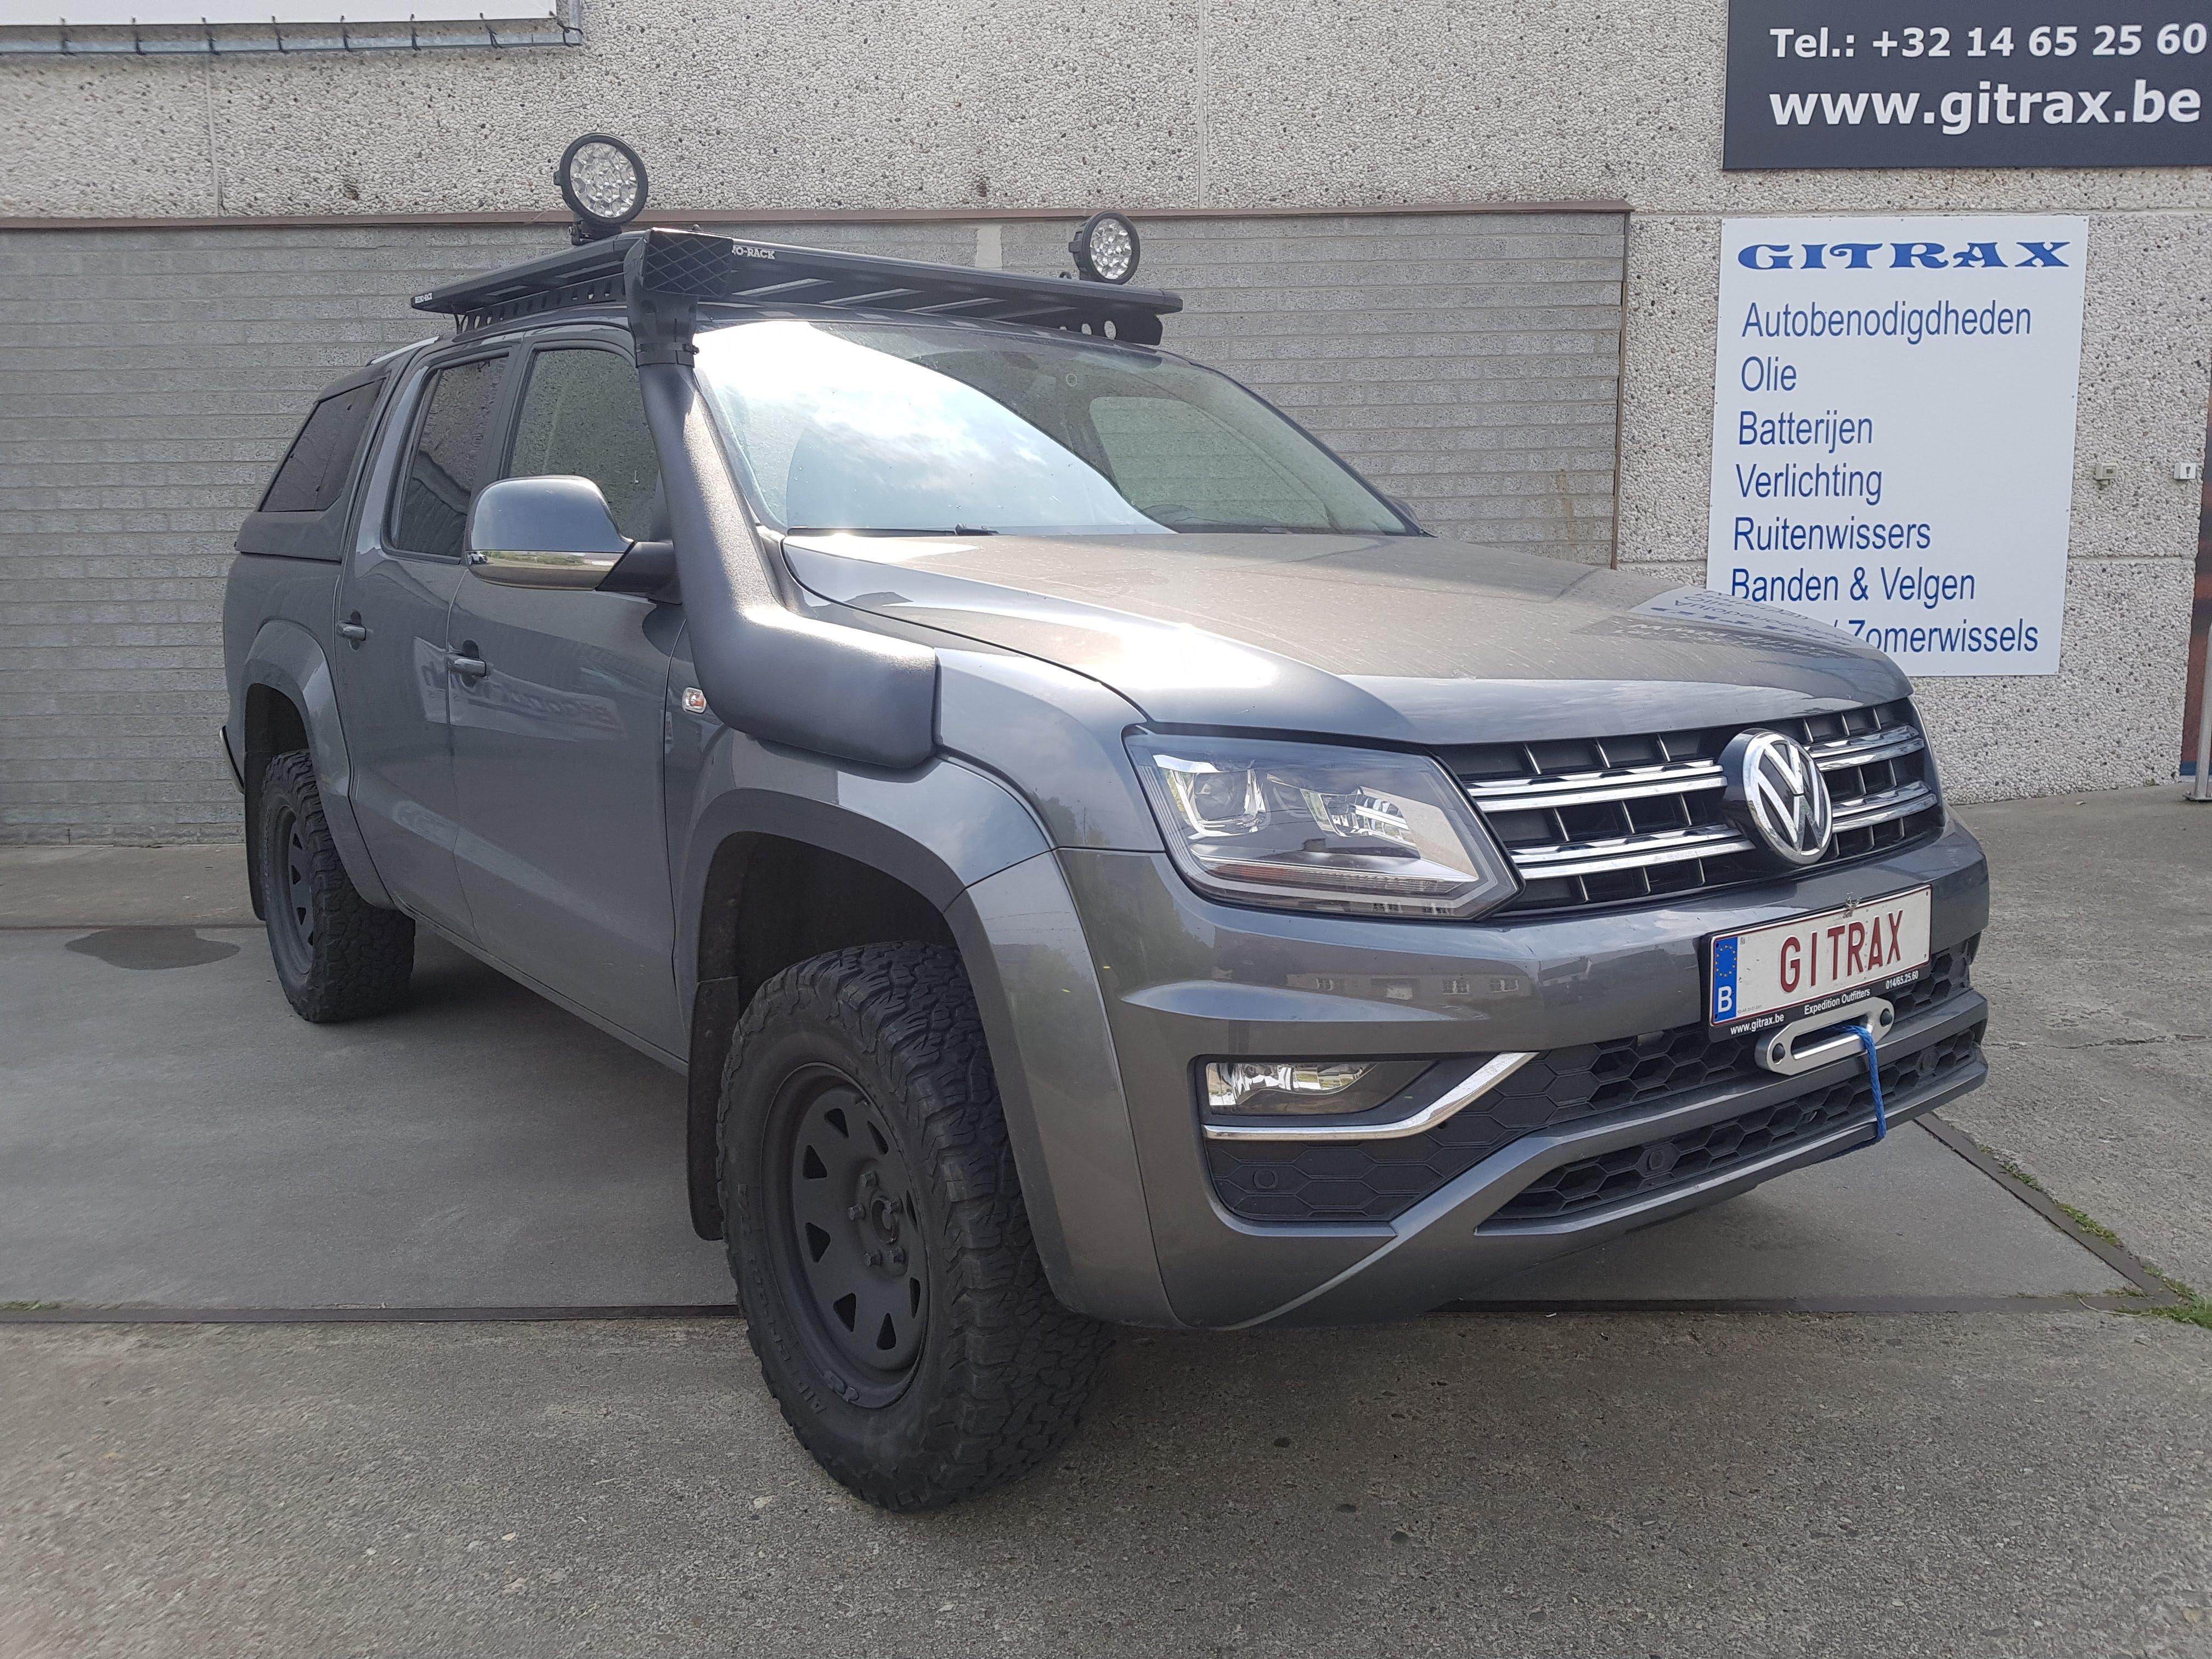 VW Amarok Gitrax